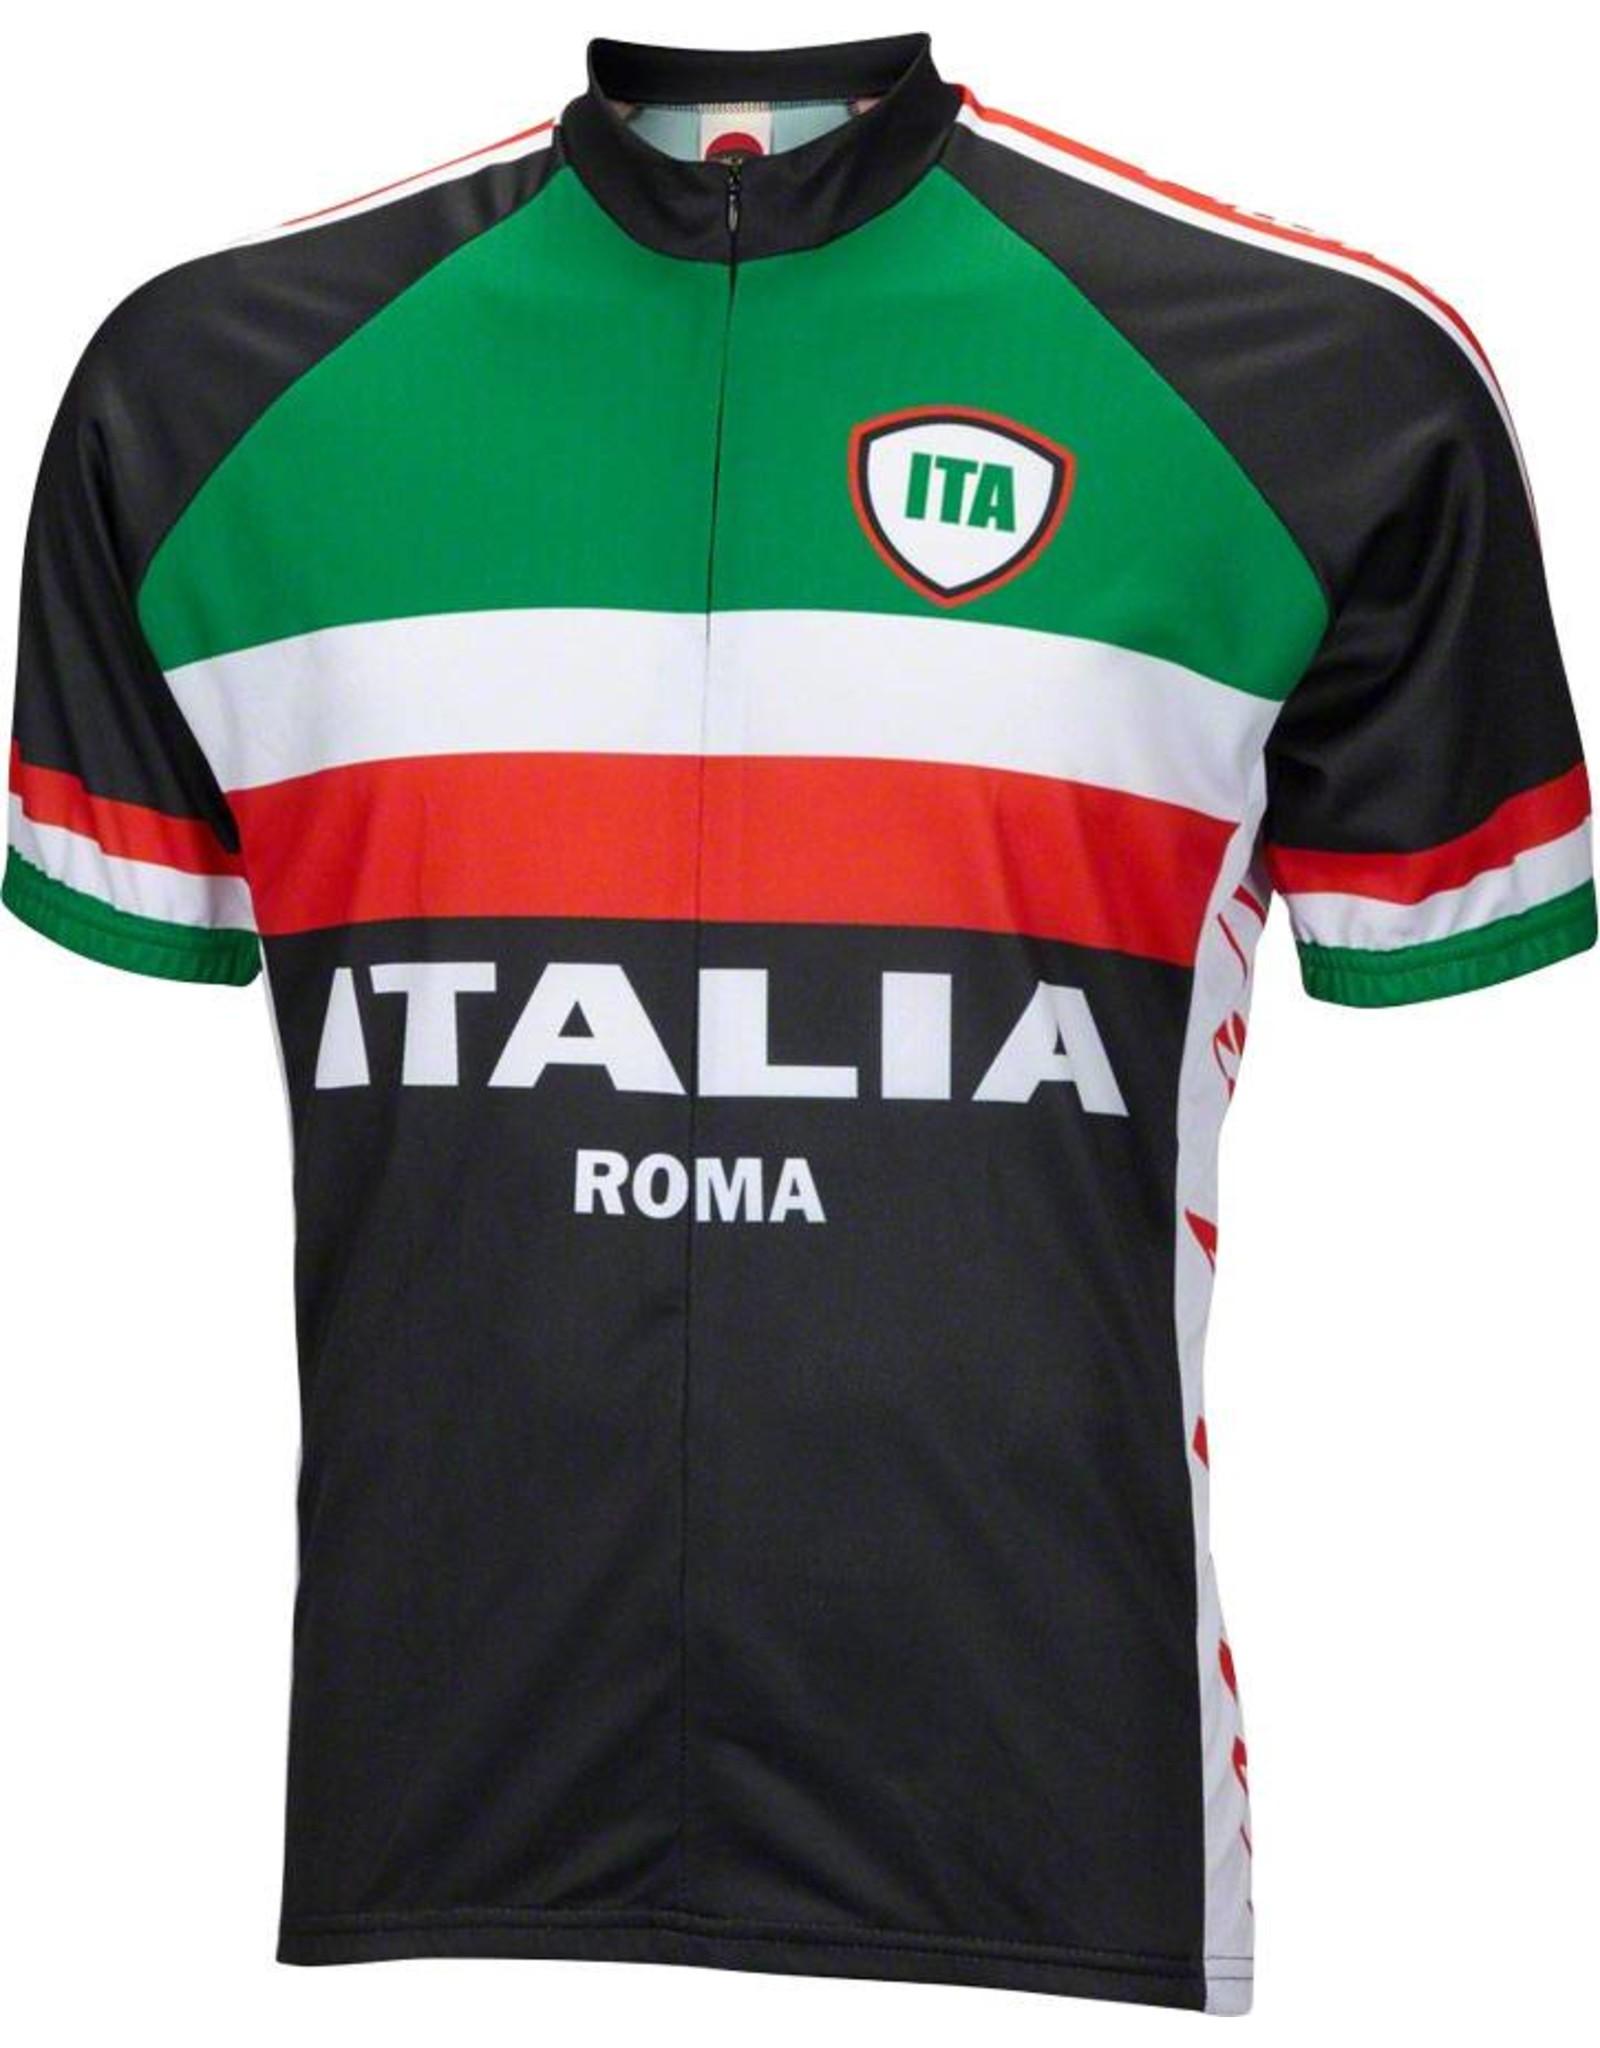 World Jerseys World Jerseys Italia Men's Cycling Jersey: Black, XL